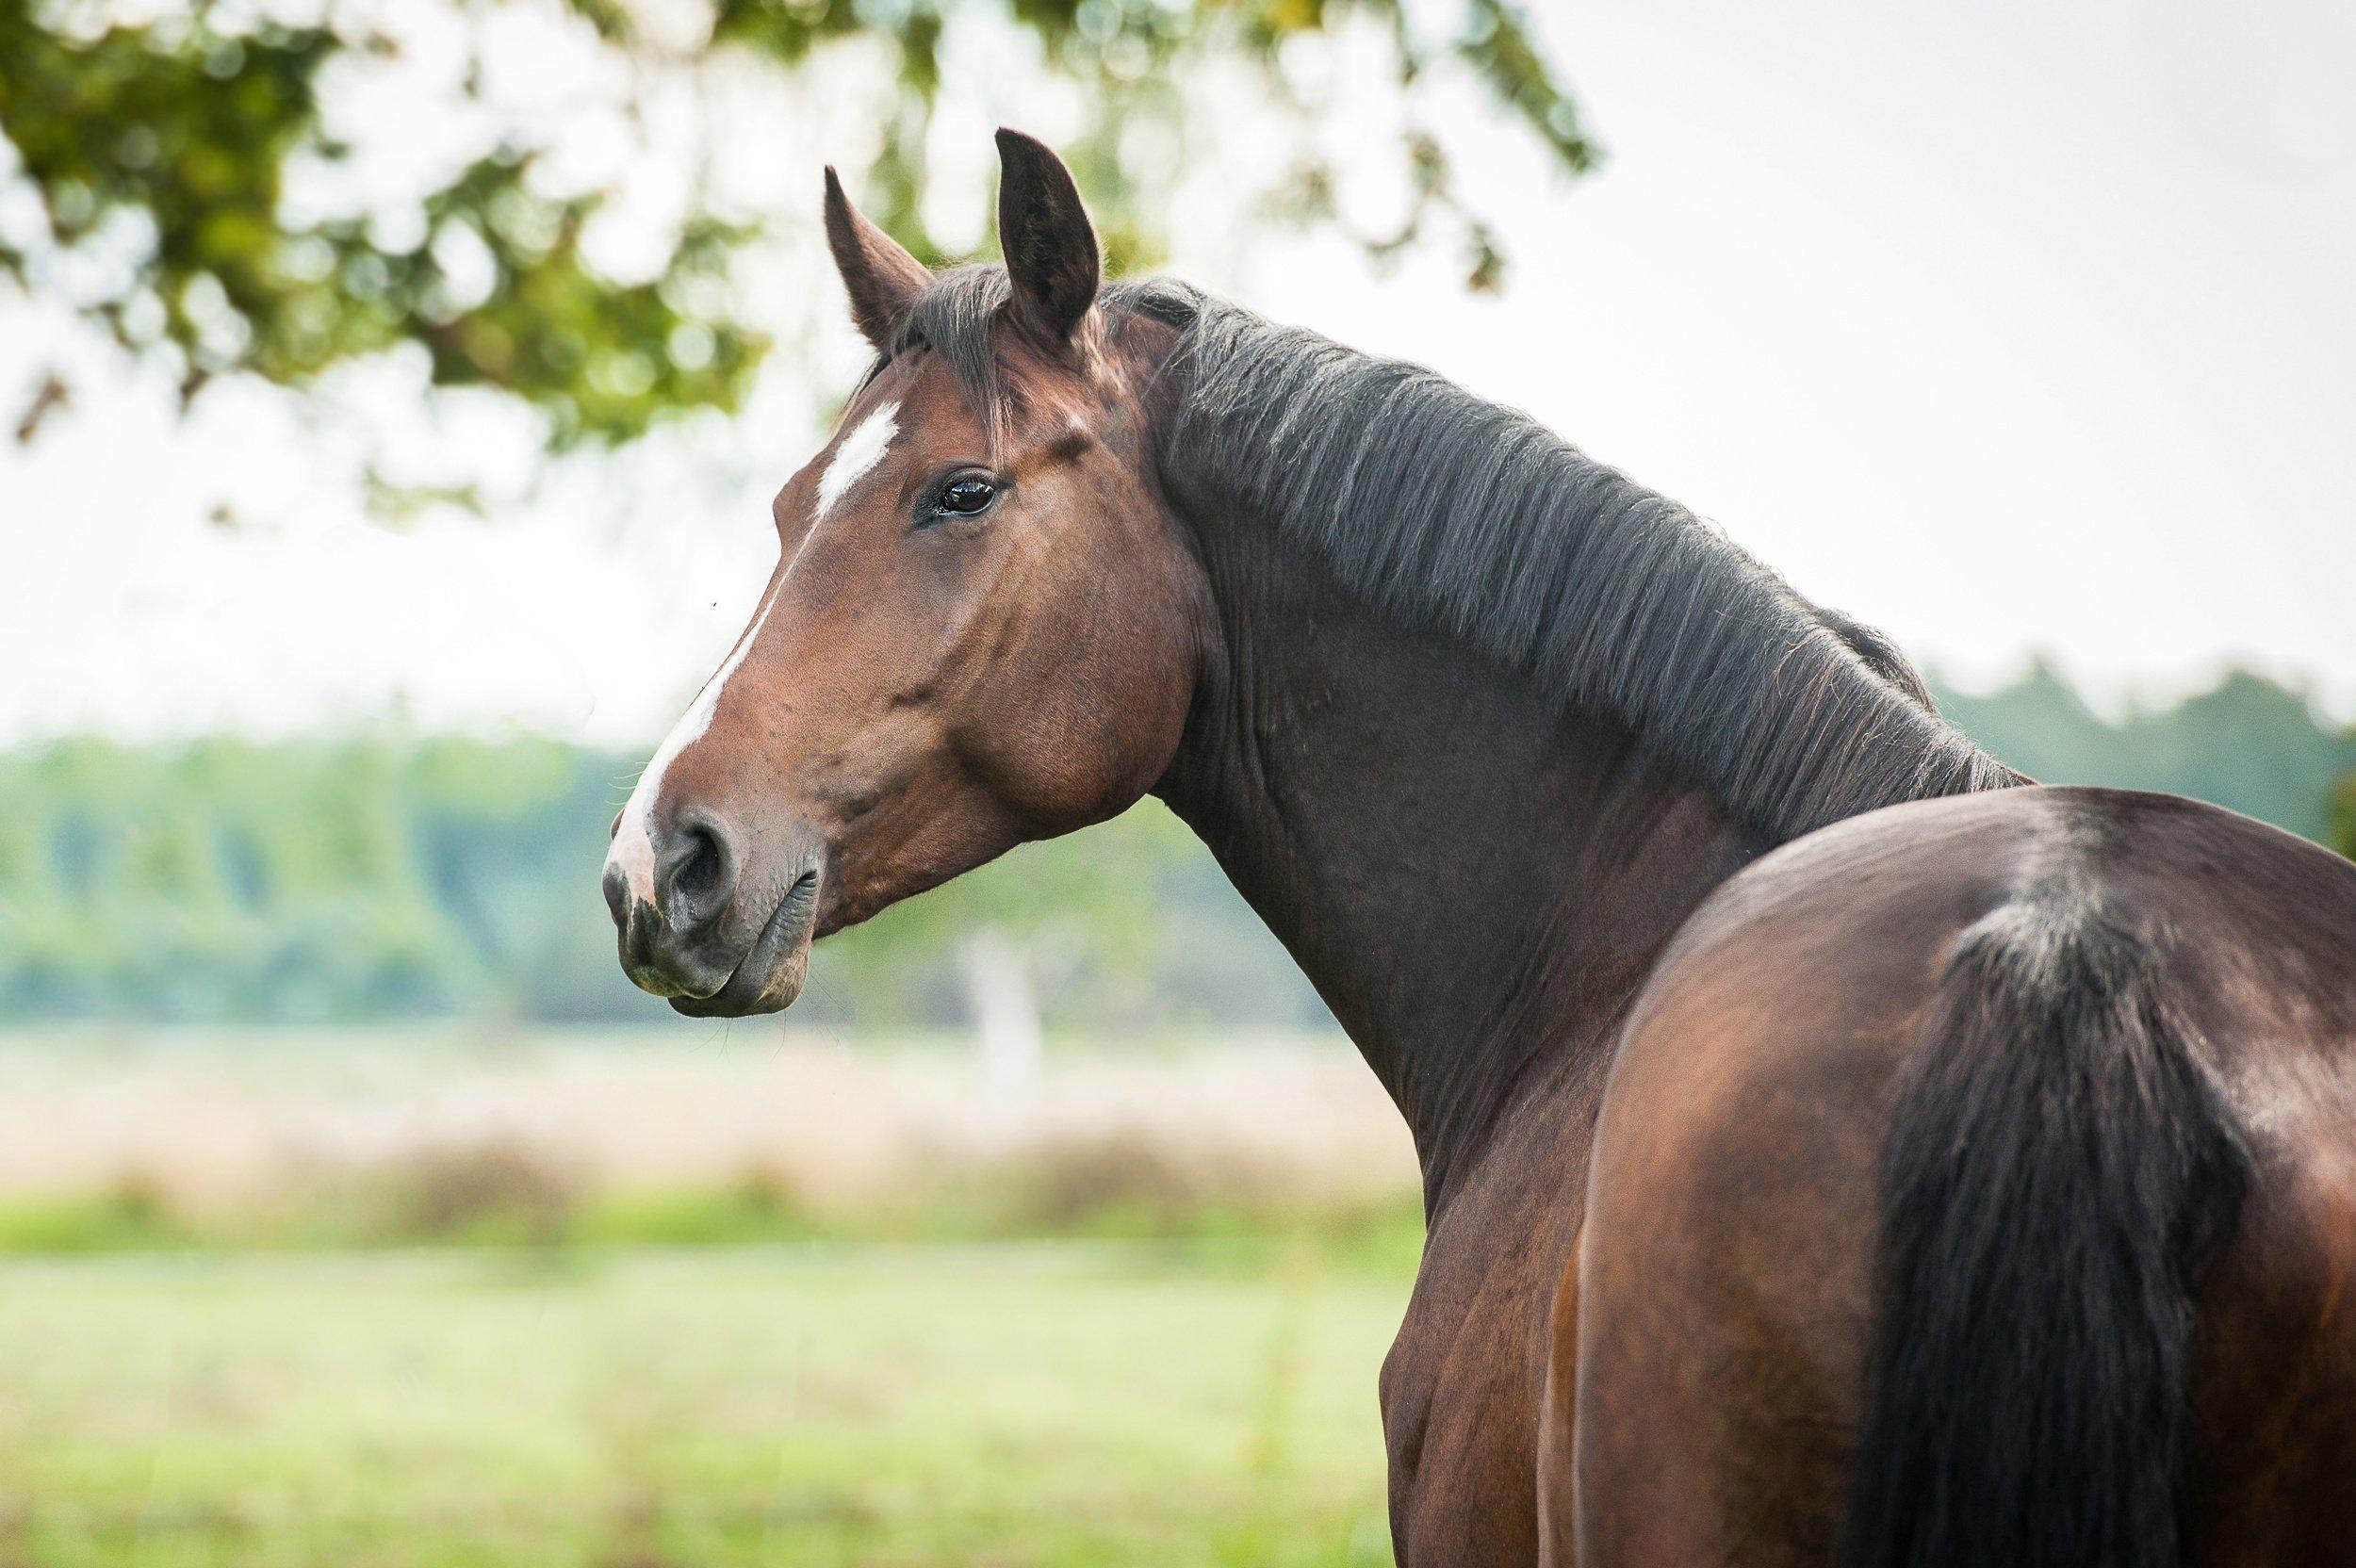 Portrait of beautiful warmblood horse looking back